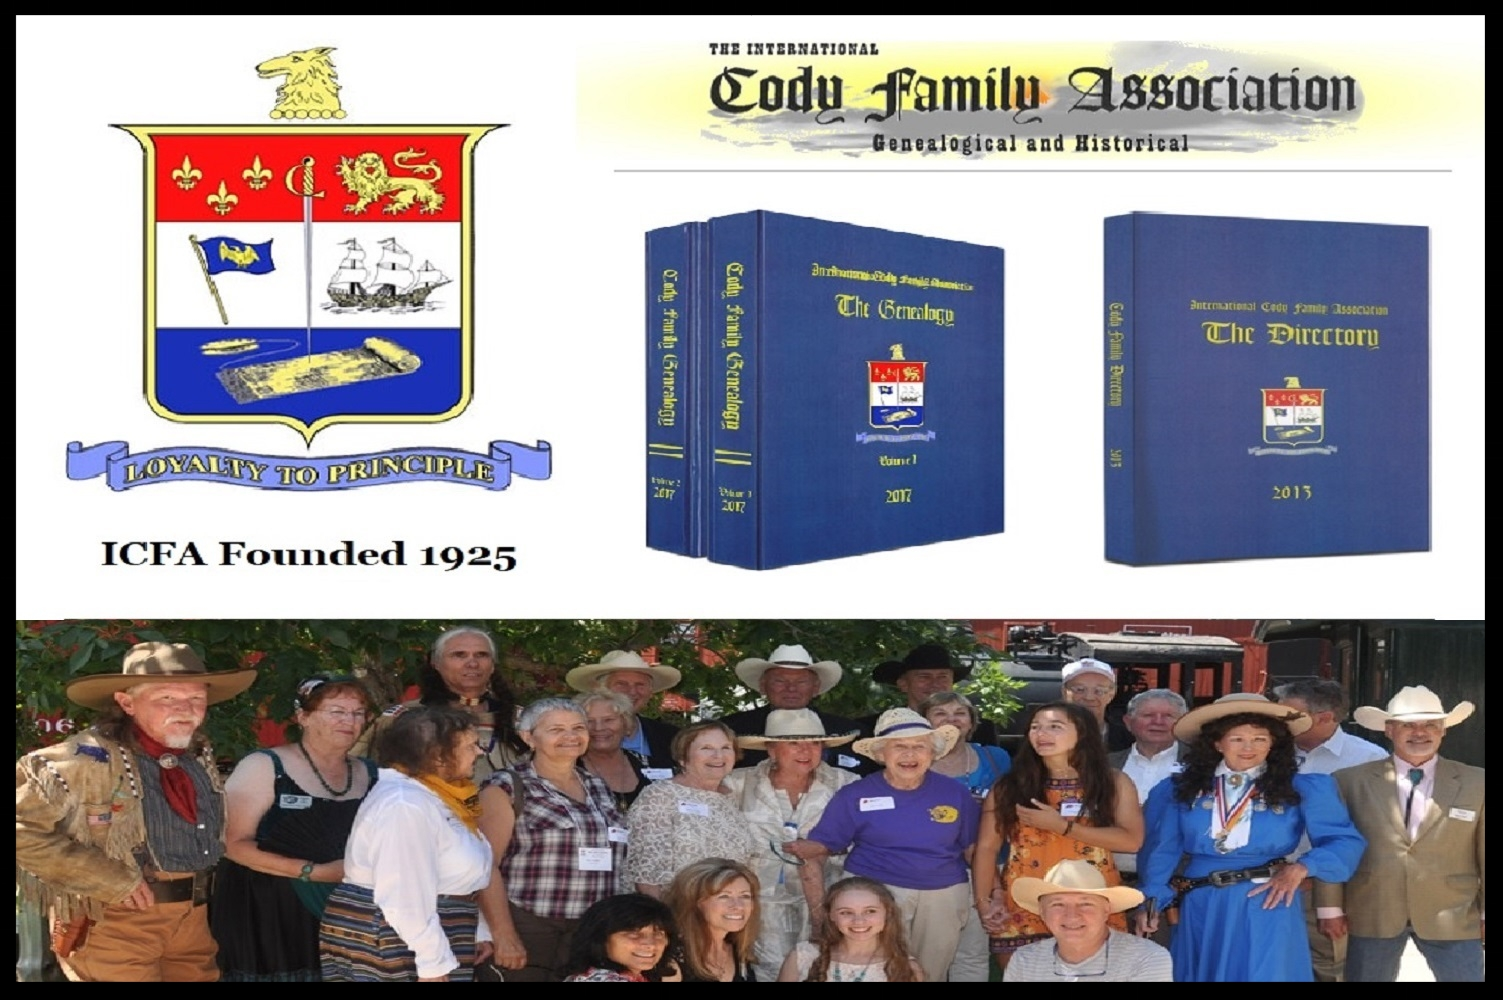 ICFA - International Cody Family Association